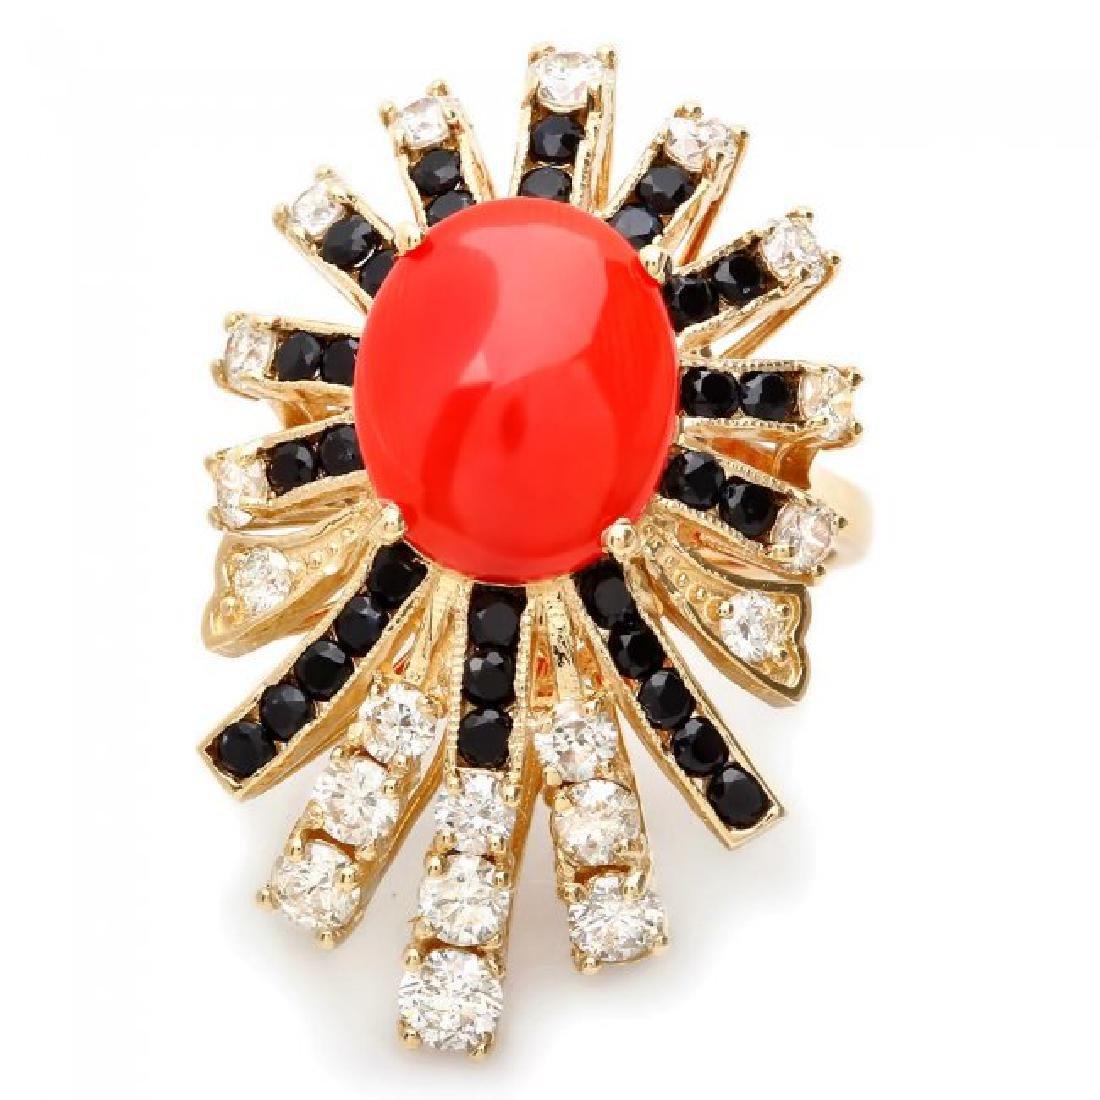 14k Yellow Gold 3.00ct Coral 1.55ct Diamond Ring - 2